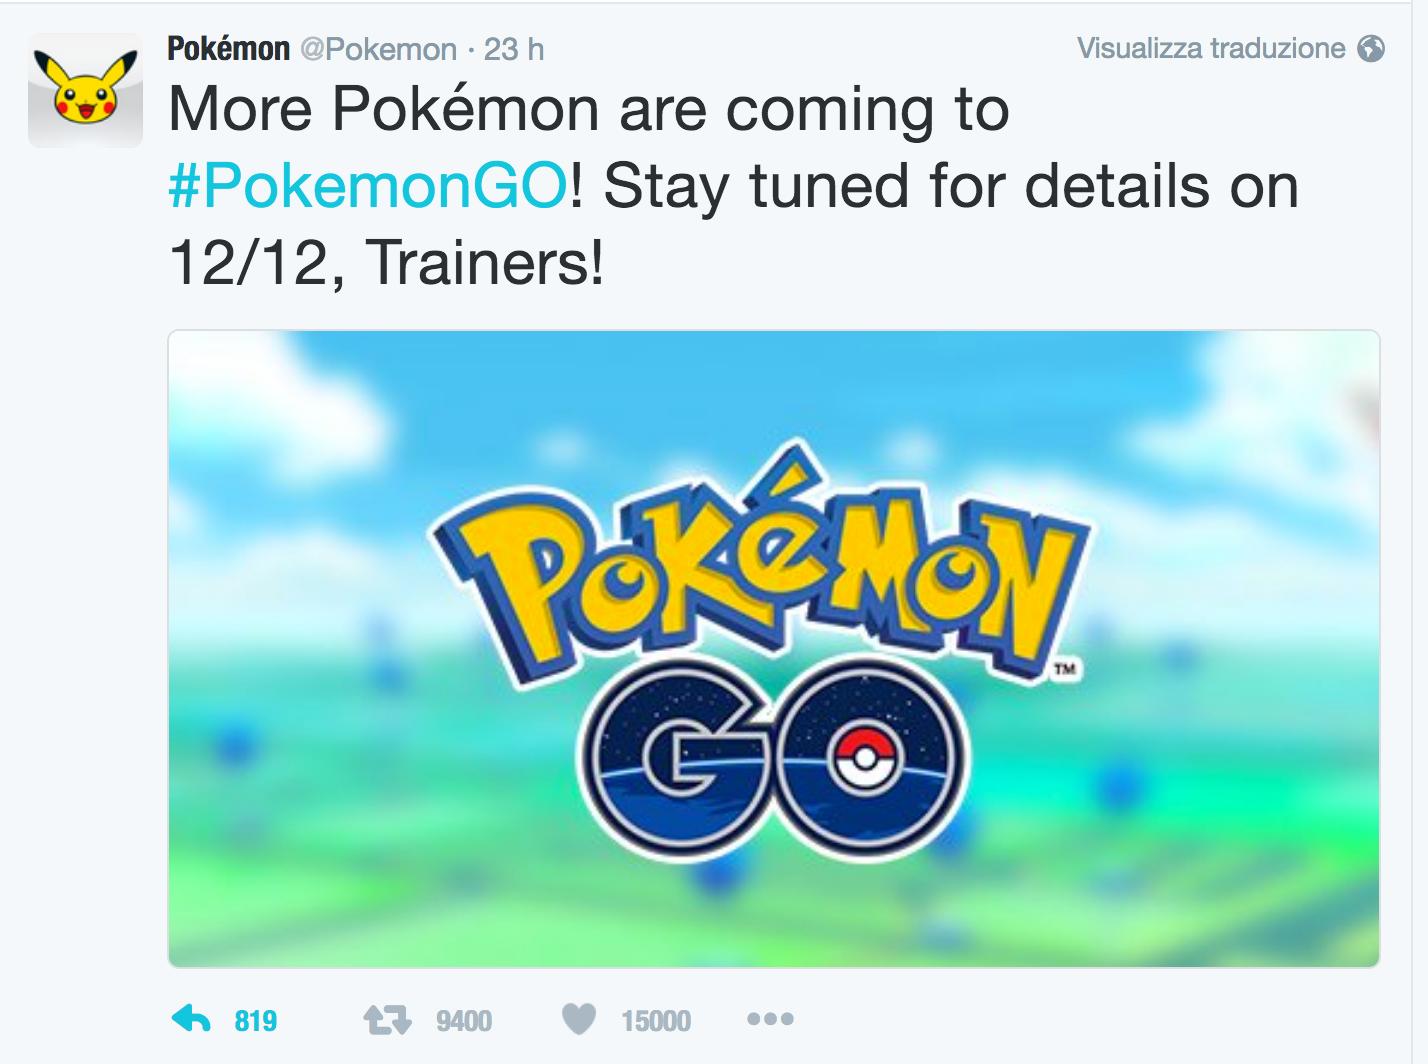 Nuovi Pokémon in arrivo